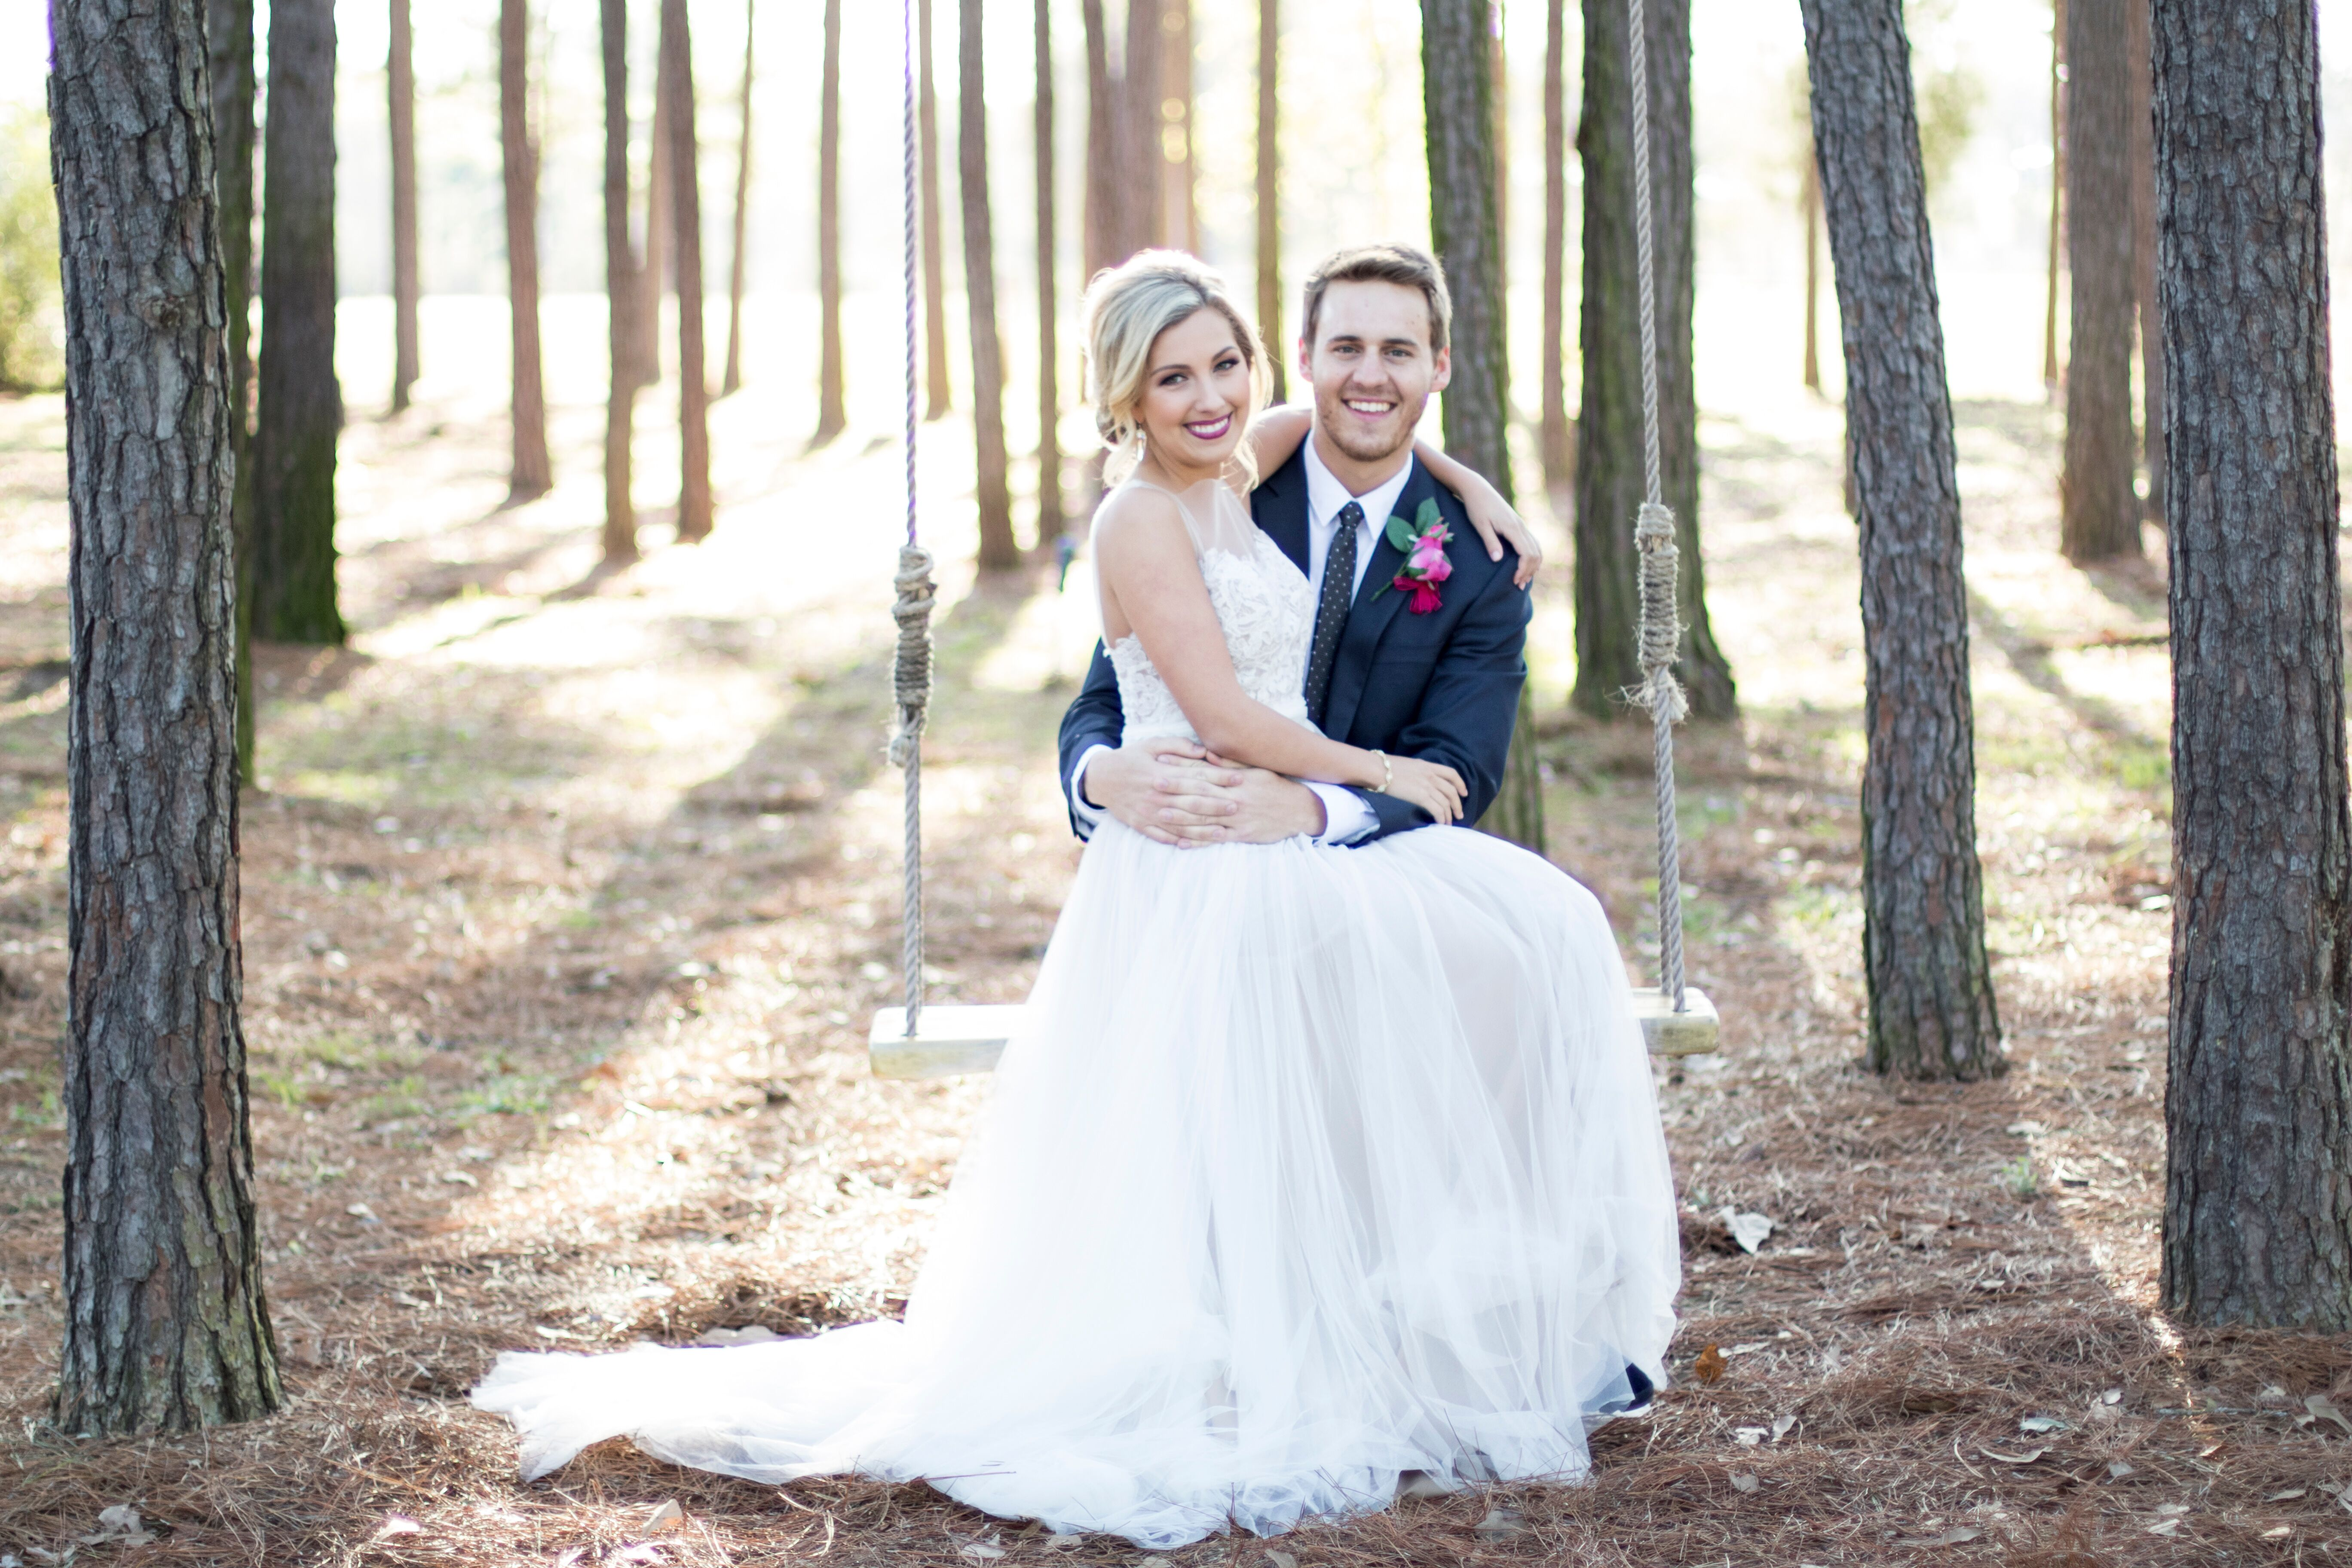 An Elegant Rustic Wedding At Crystal Springs In Magnolia Texas